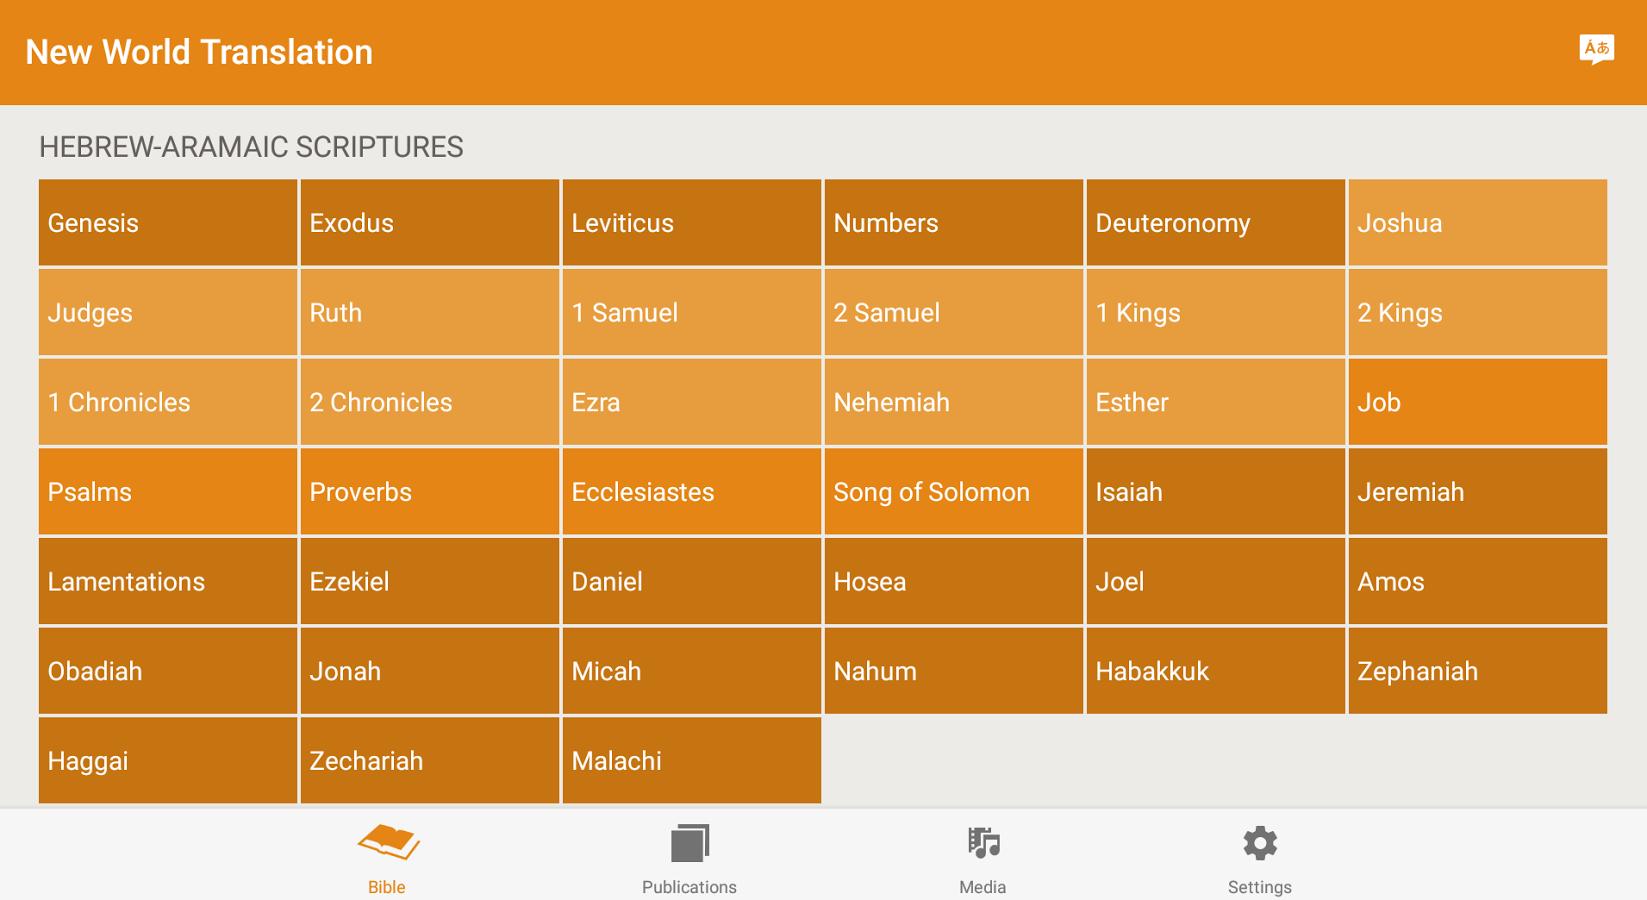 Descargar JW Library Sign Language APK 1.2.15 APK para Android ...